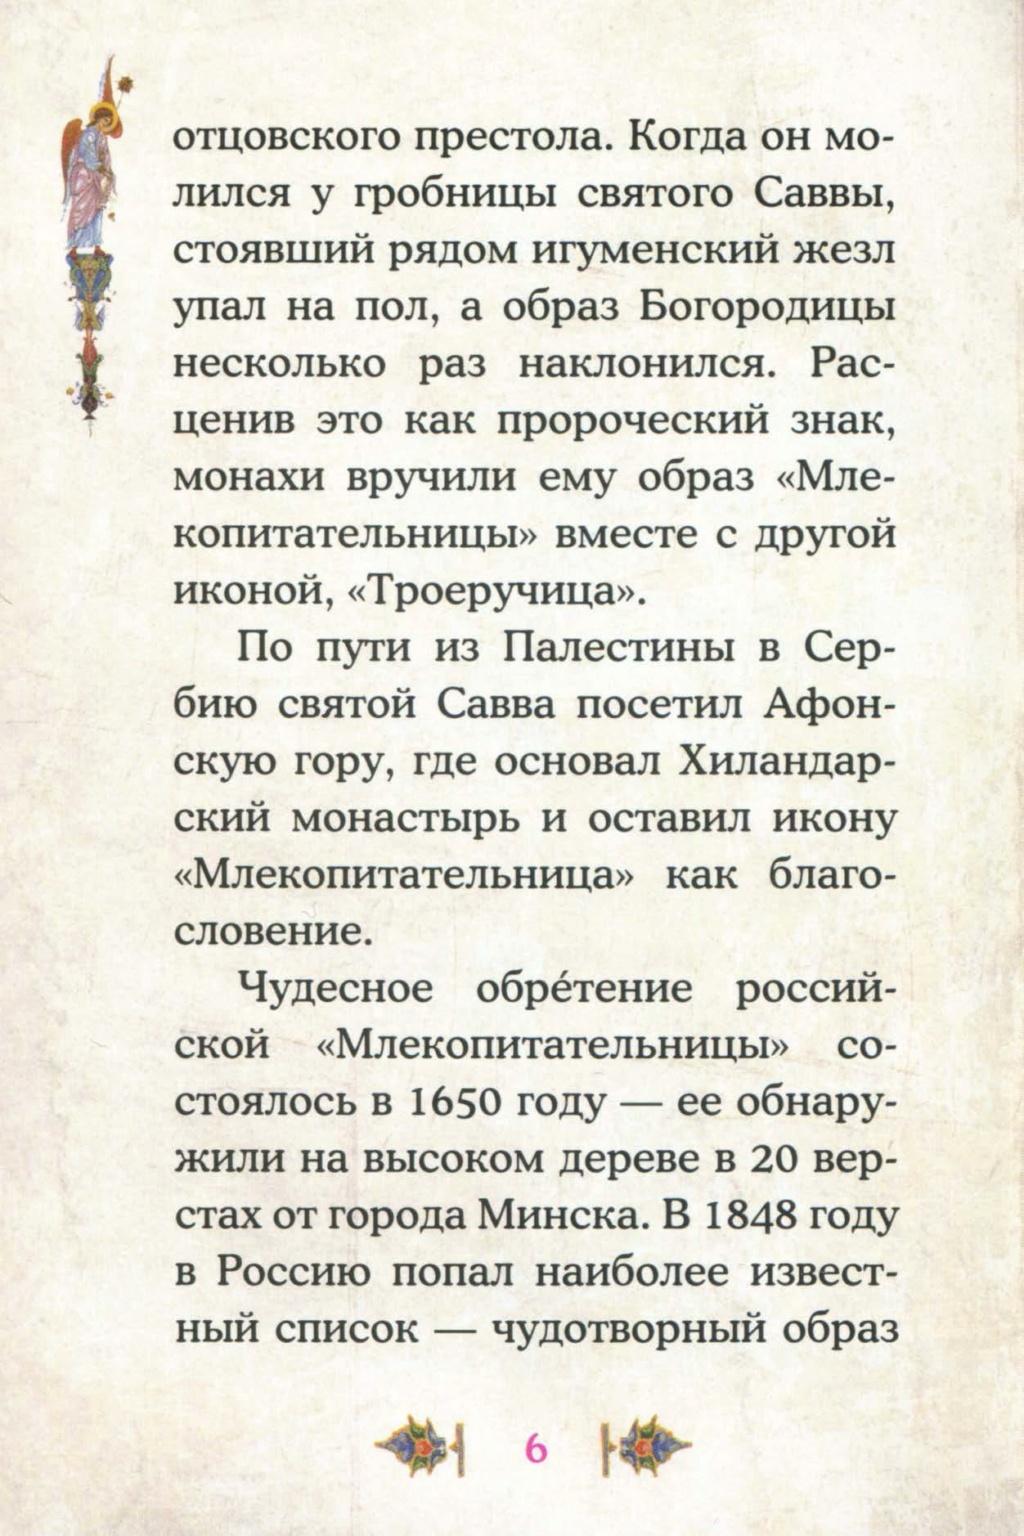 ИКОНА МЛЕКОПИТАТЕЛЬНИЦА Aaao_o14